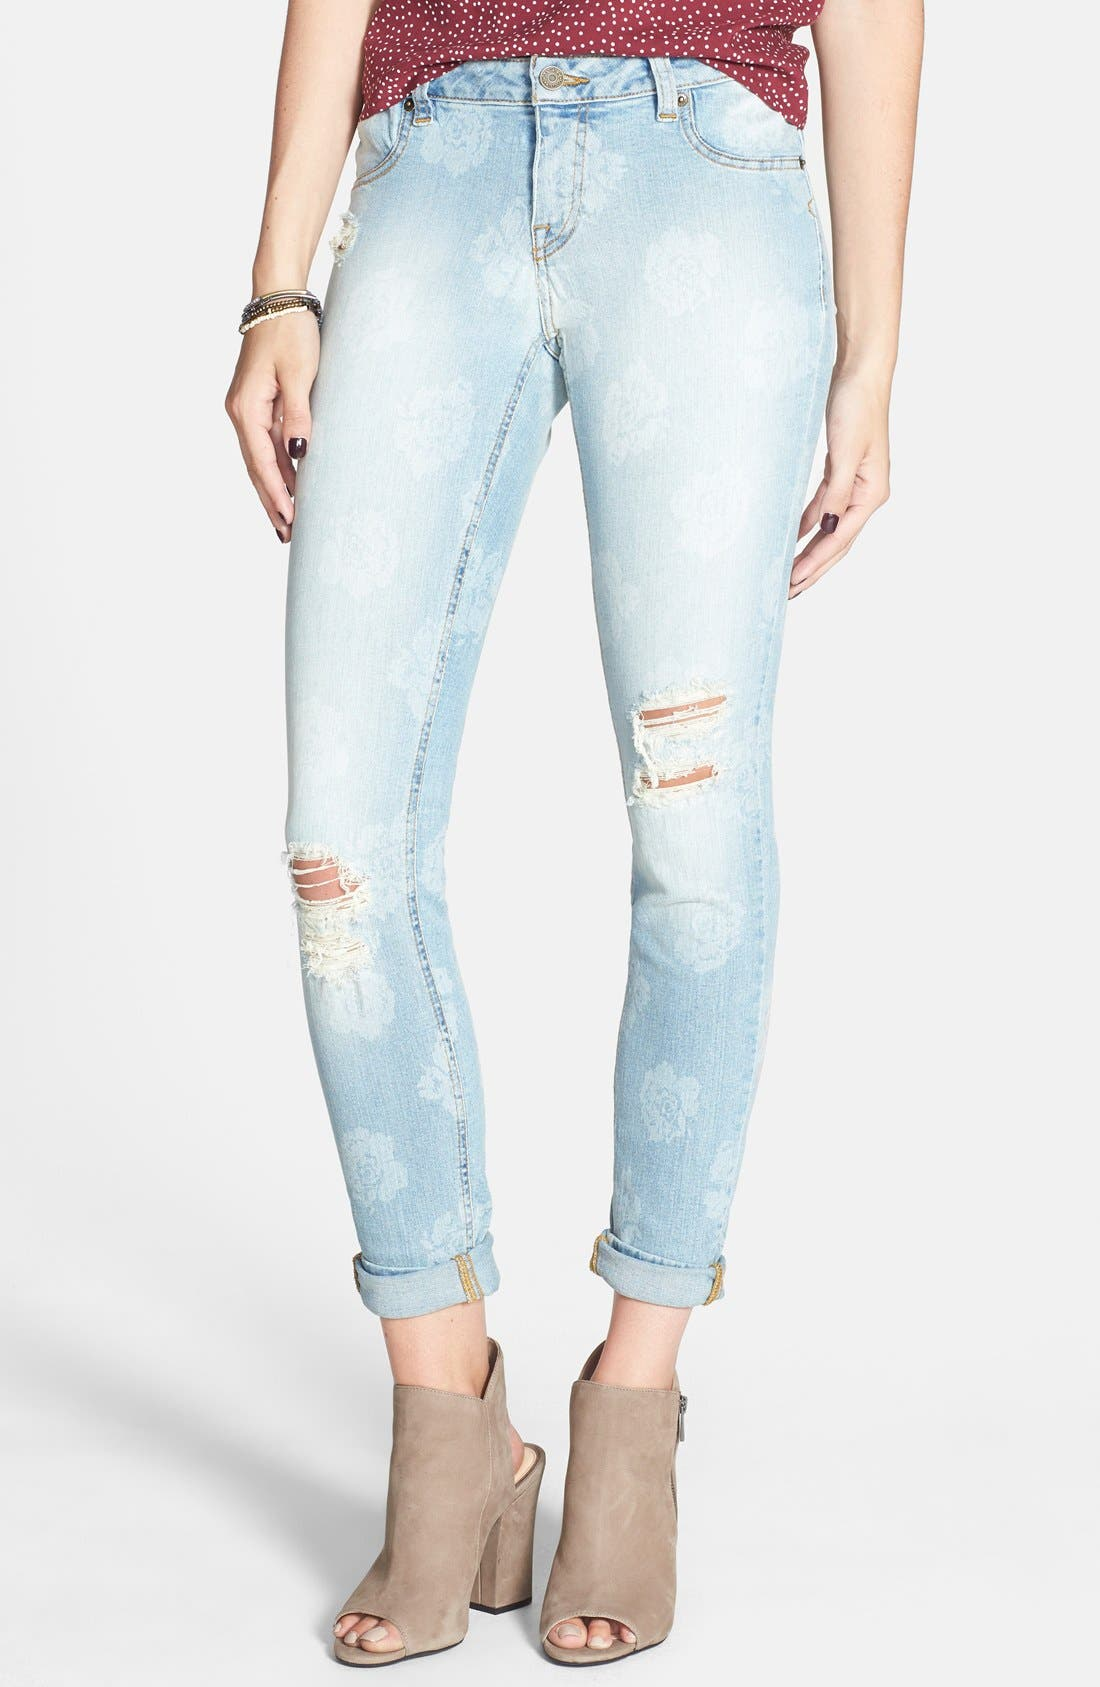 Alternate Image 1 Selected - Volcom 'Liberator' Print Skinny Jeans